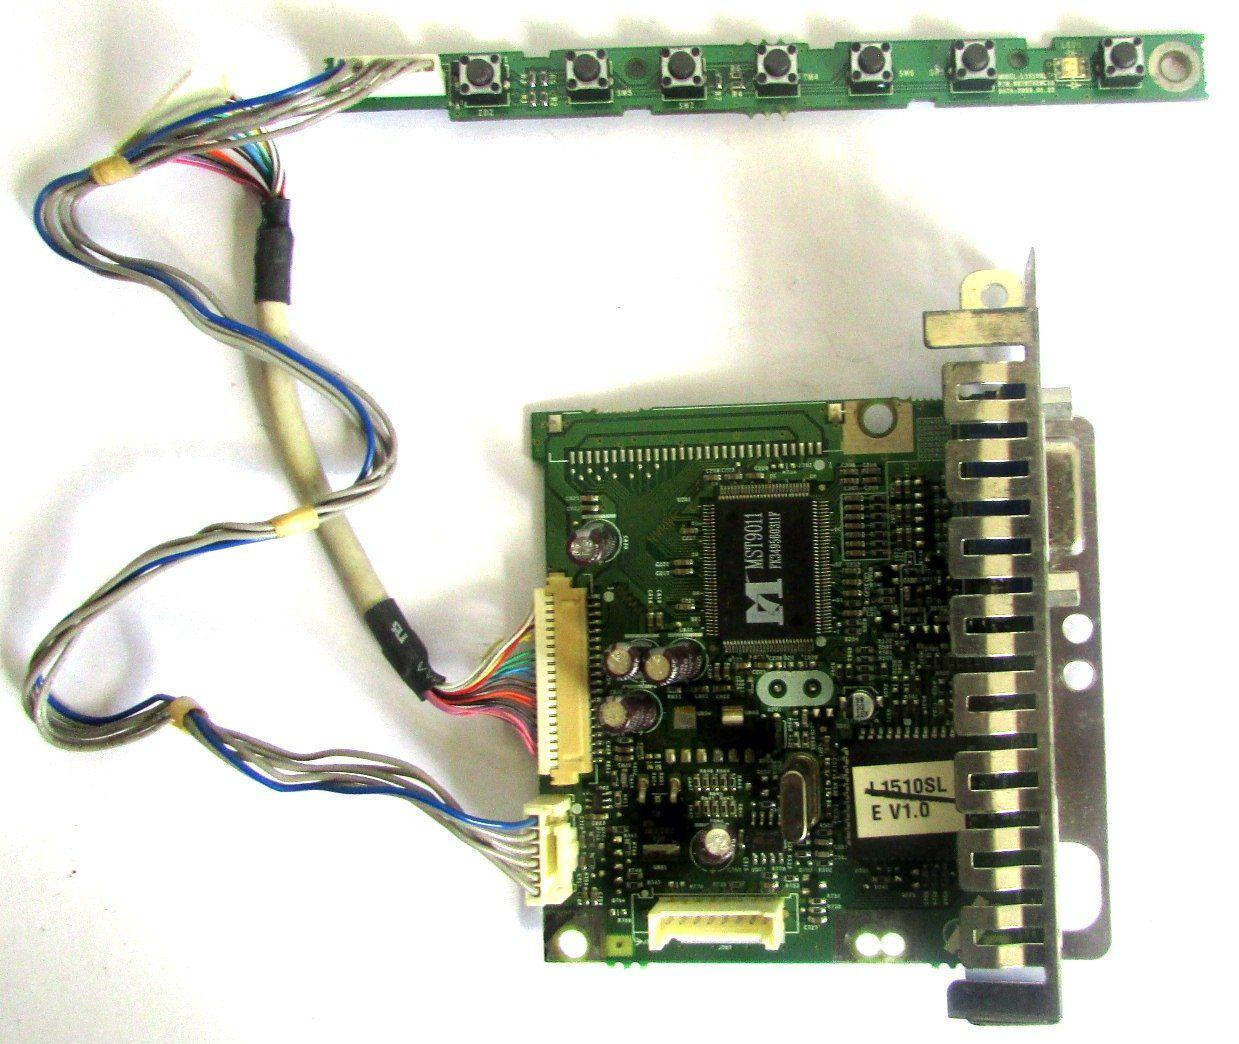 Placa Principal Logica Monitor Lg L1510sl L1511sl 1710sm (semi novo)